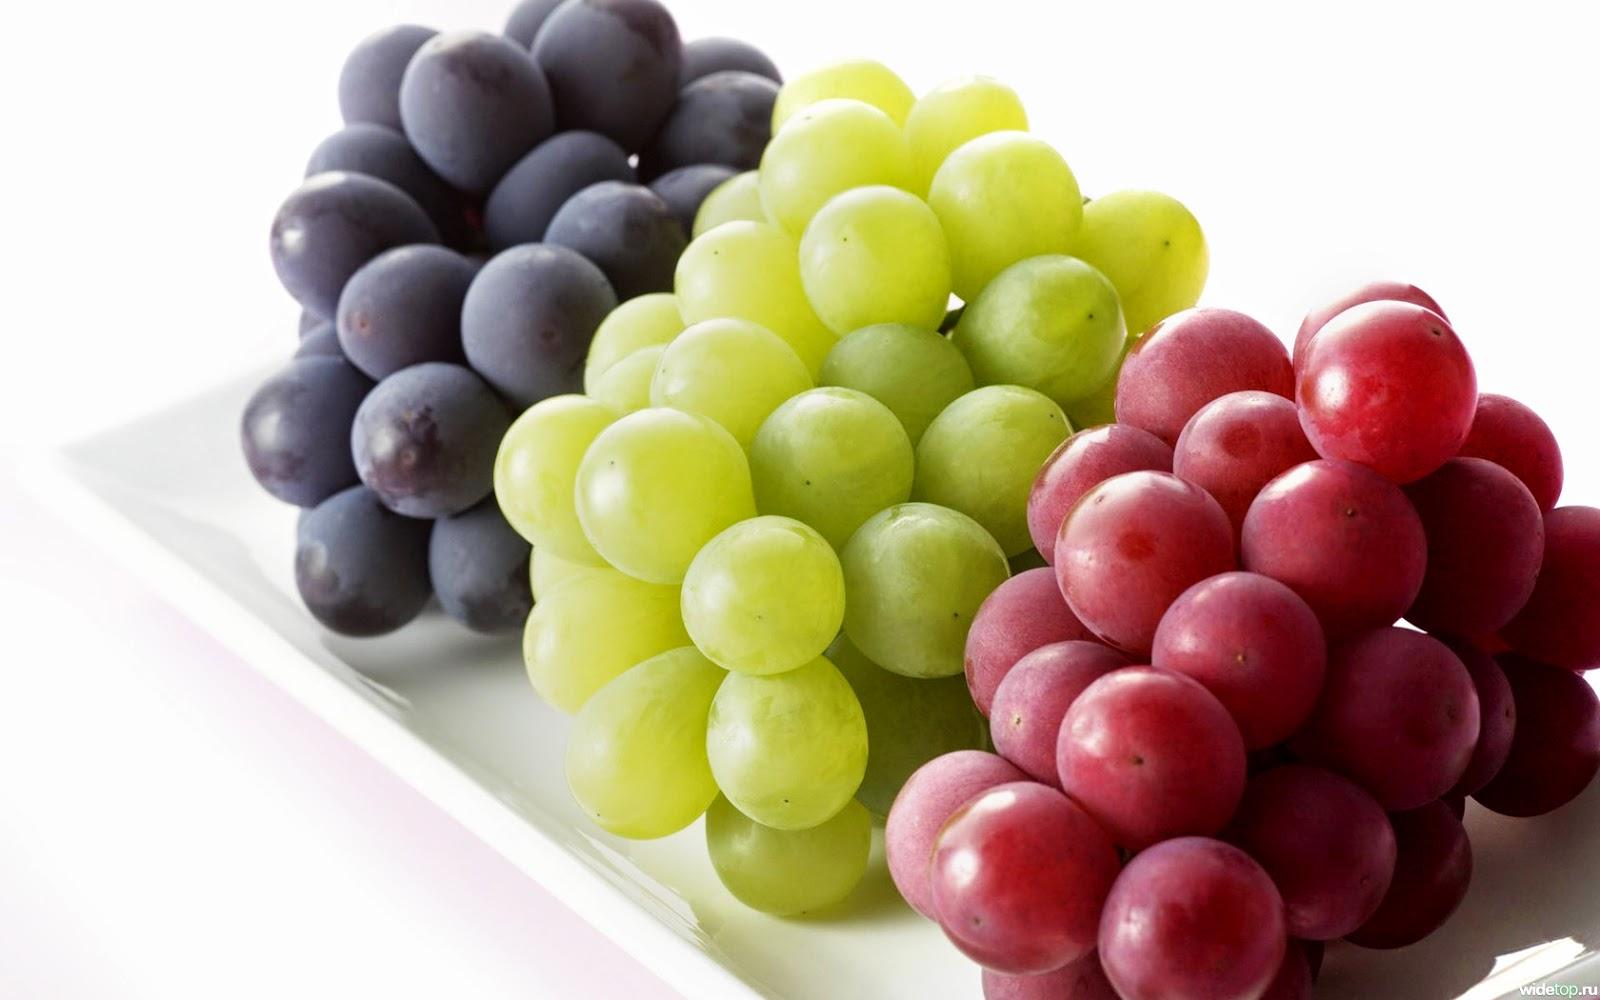 Manfaat-Buah-Anggur